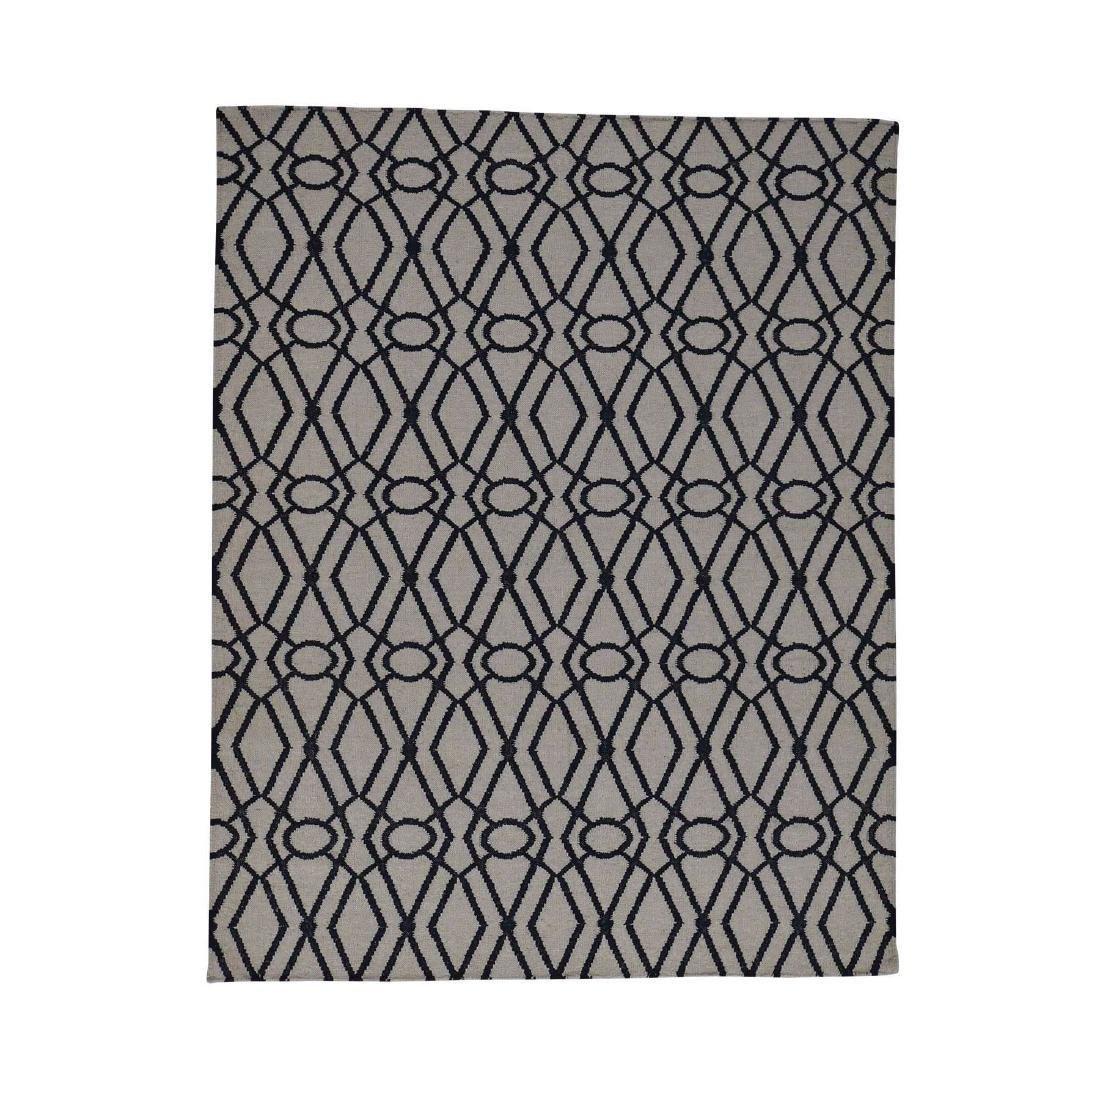 Wool Durie Kilim Flat Weave Hand-Woven Rug 5.3x6.10